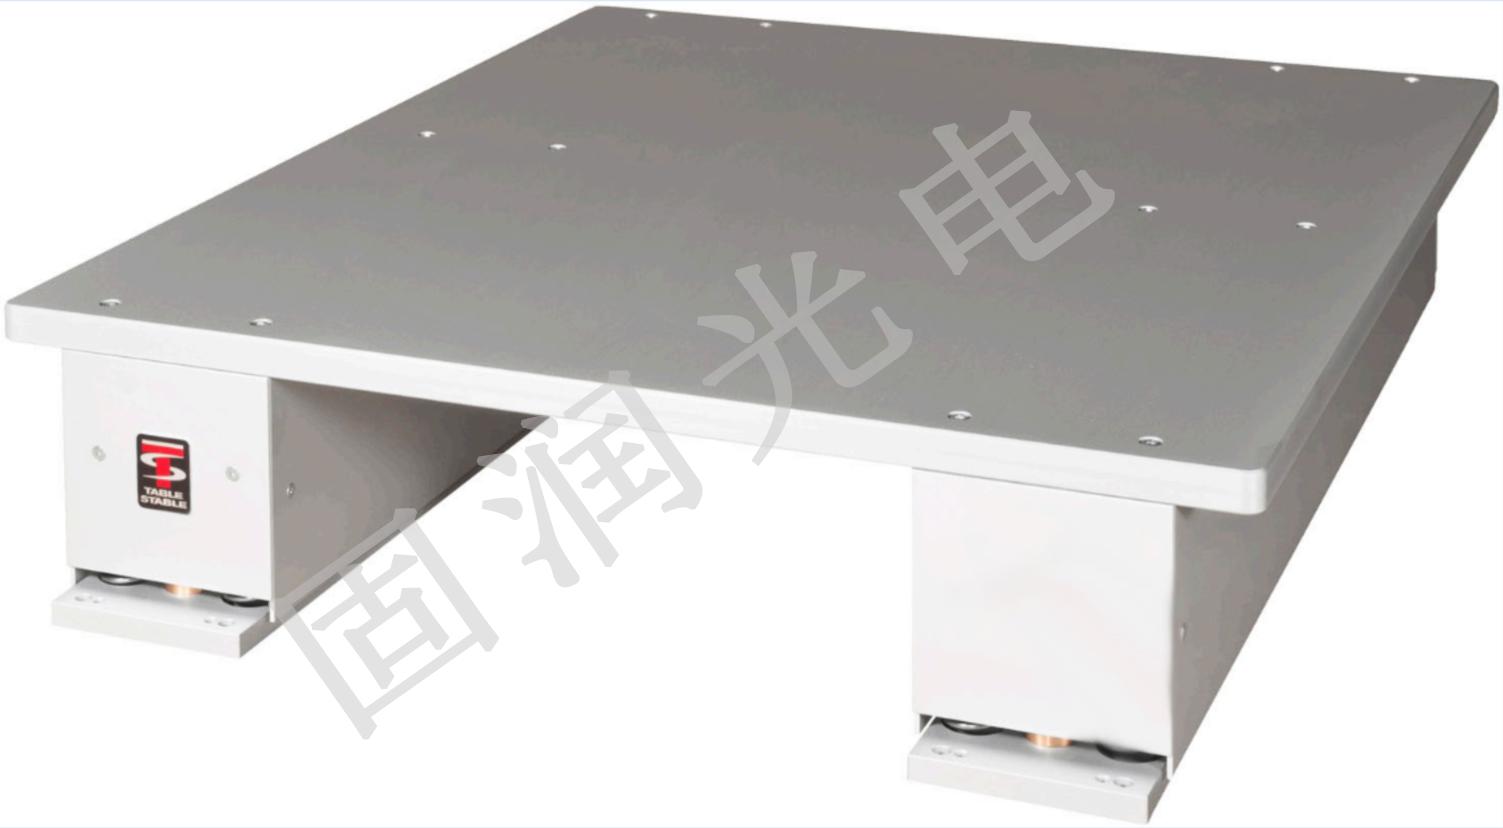 Herzan主动隔振平台-光学调制传递函数分析仪-广州市固润光电科技有限公司